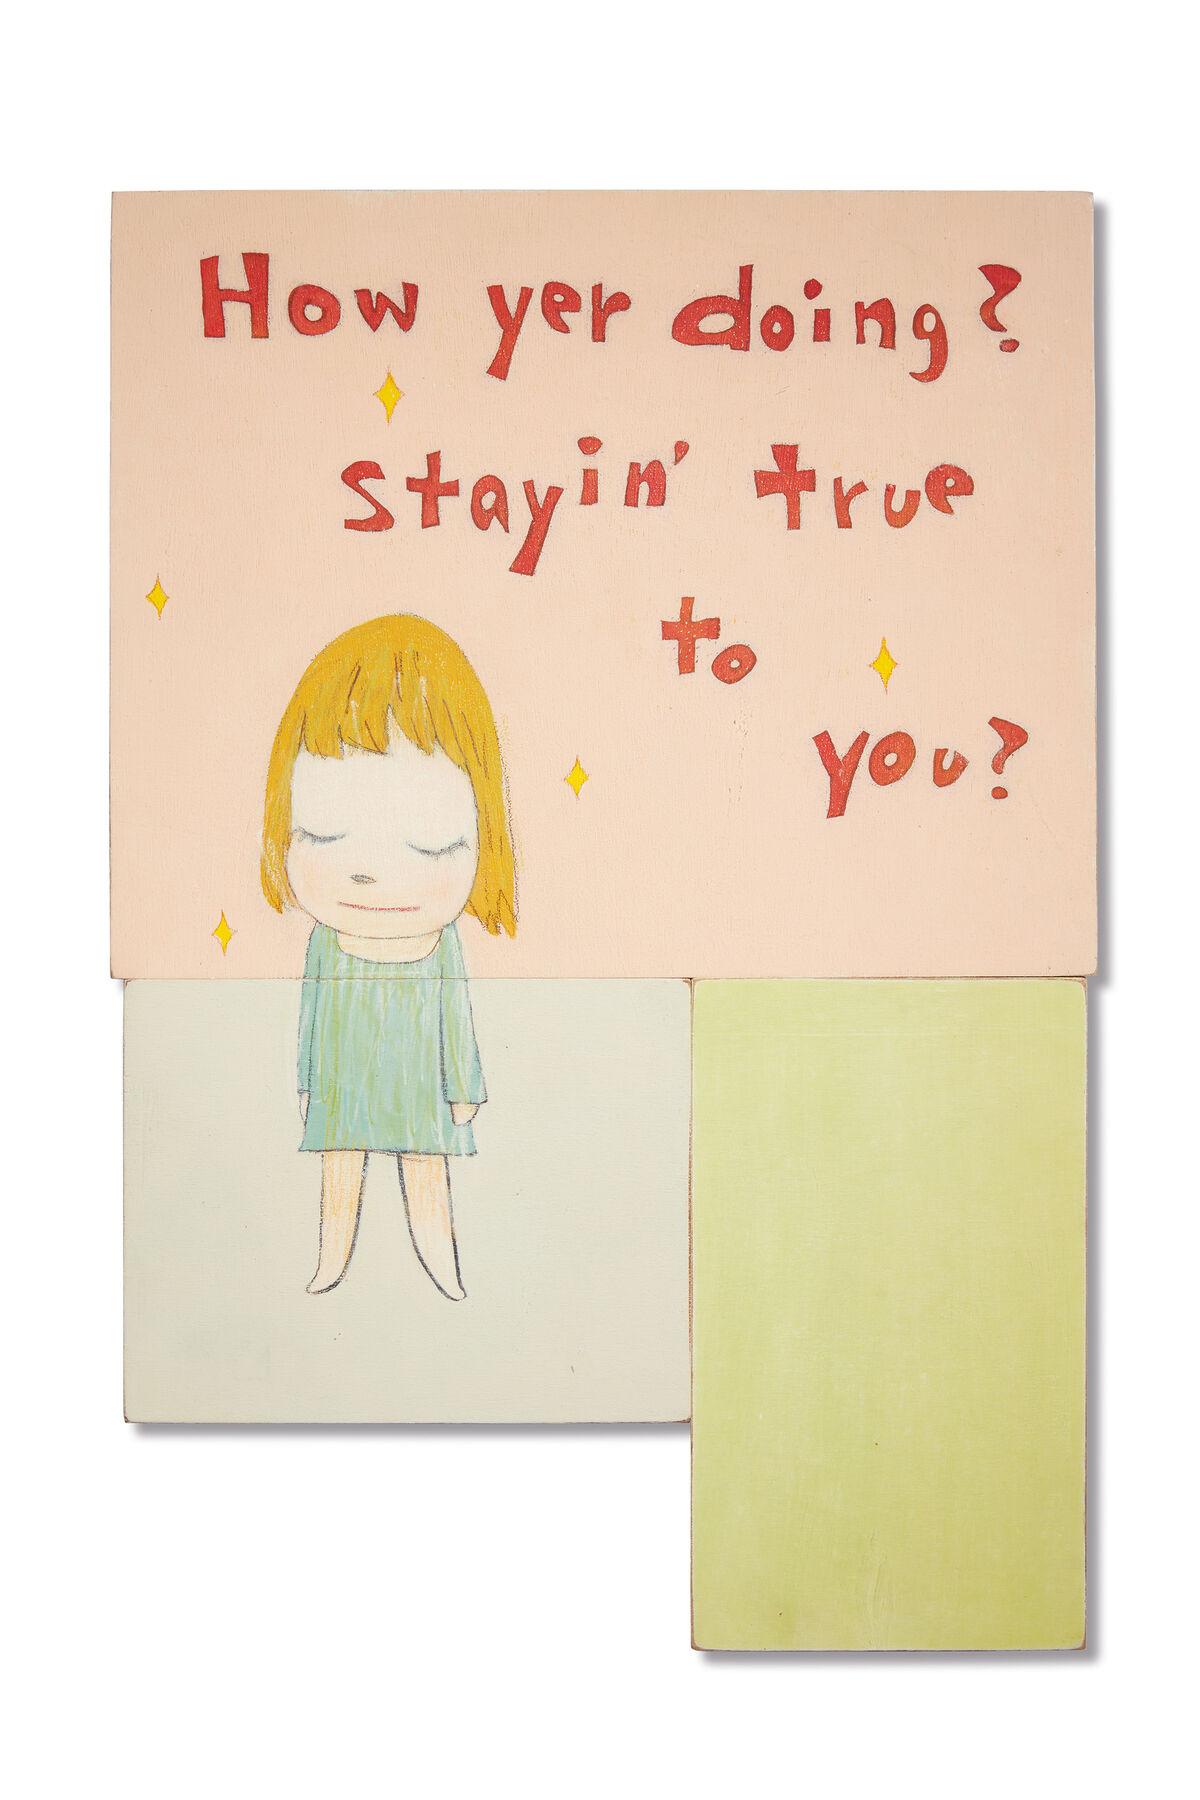 Yoshitomo Nara, How Yer Doing? Stayin' True to You?, 2006. Courtesy of Pace Gallery.